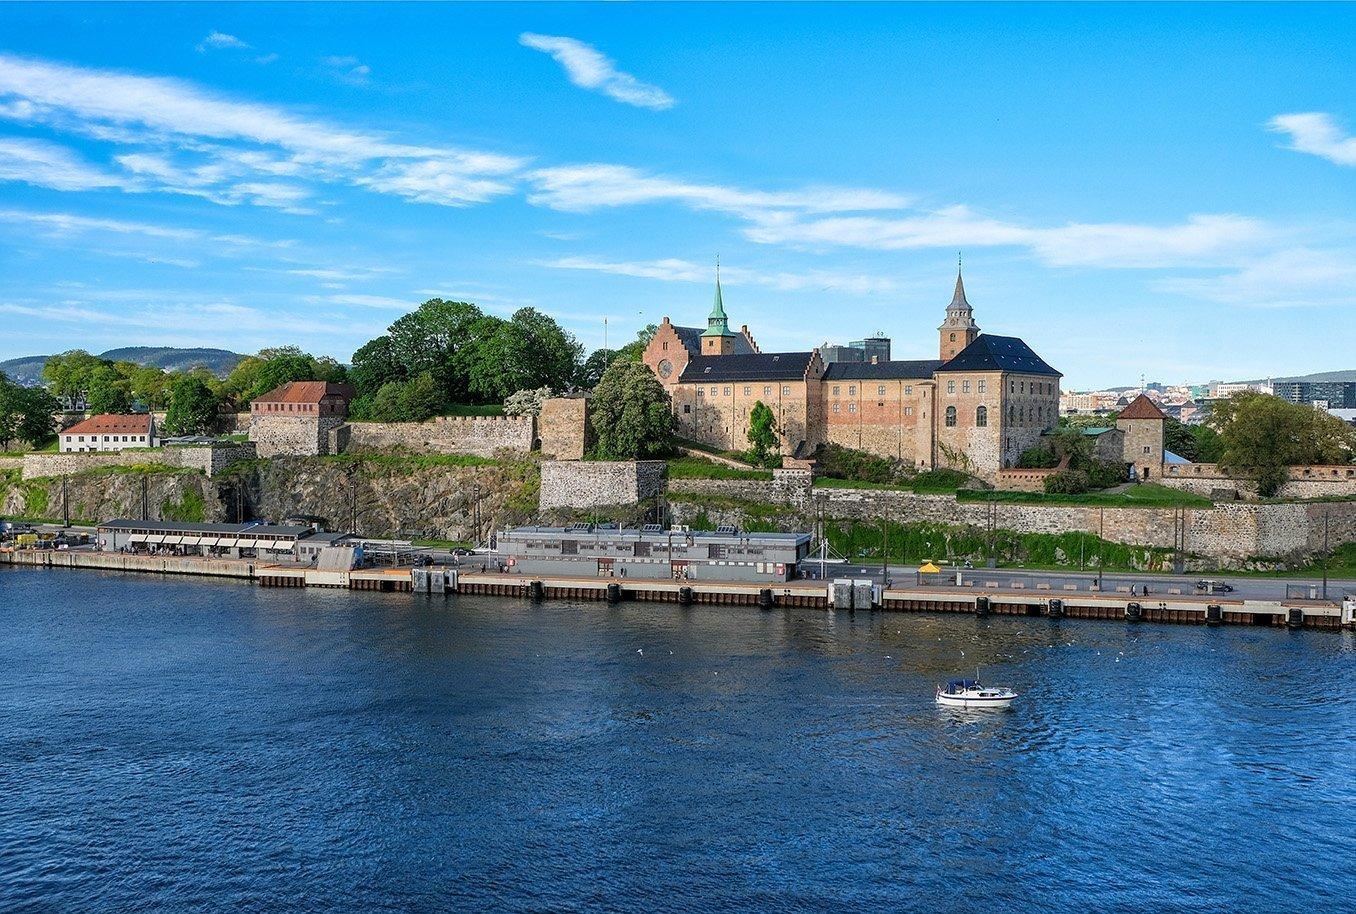 Akershus Castle in Oslo. | © redaktion93 - stock.adobe.com.